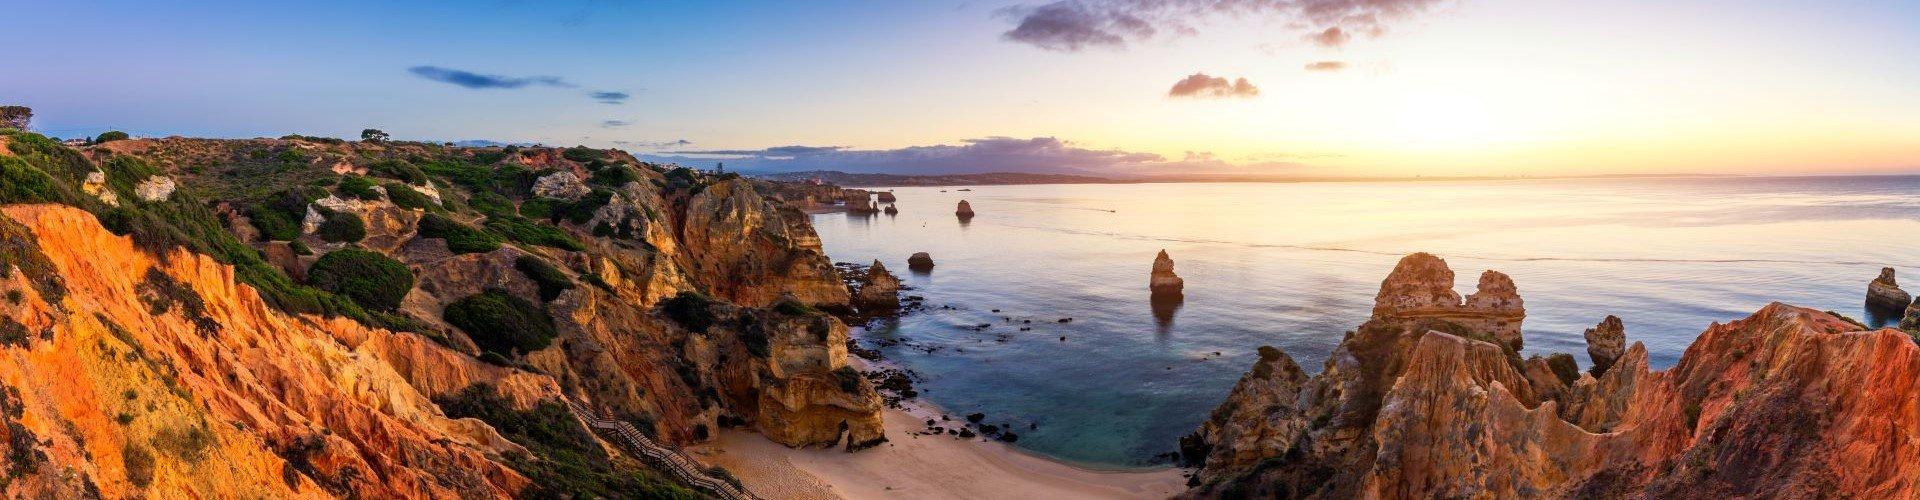 Familienurlaub an der Algarve